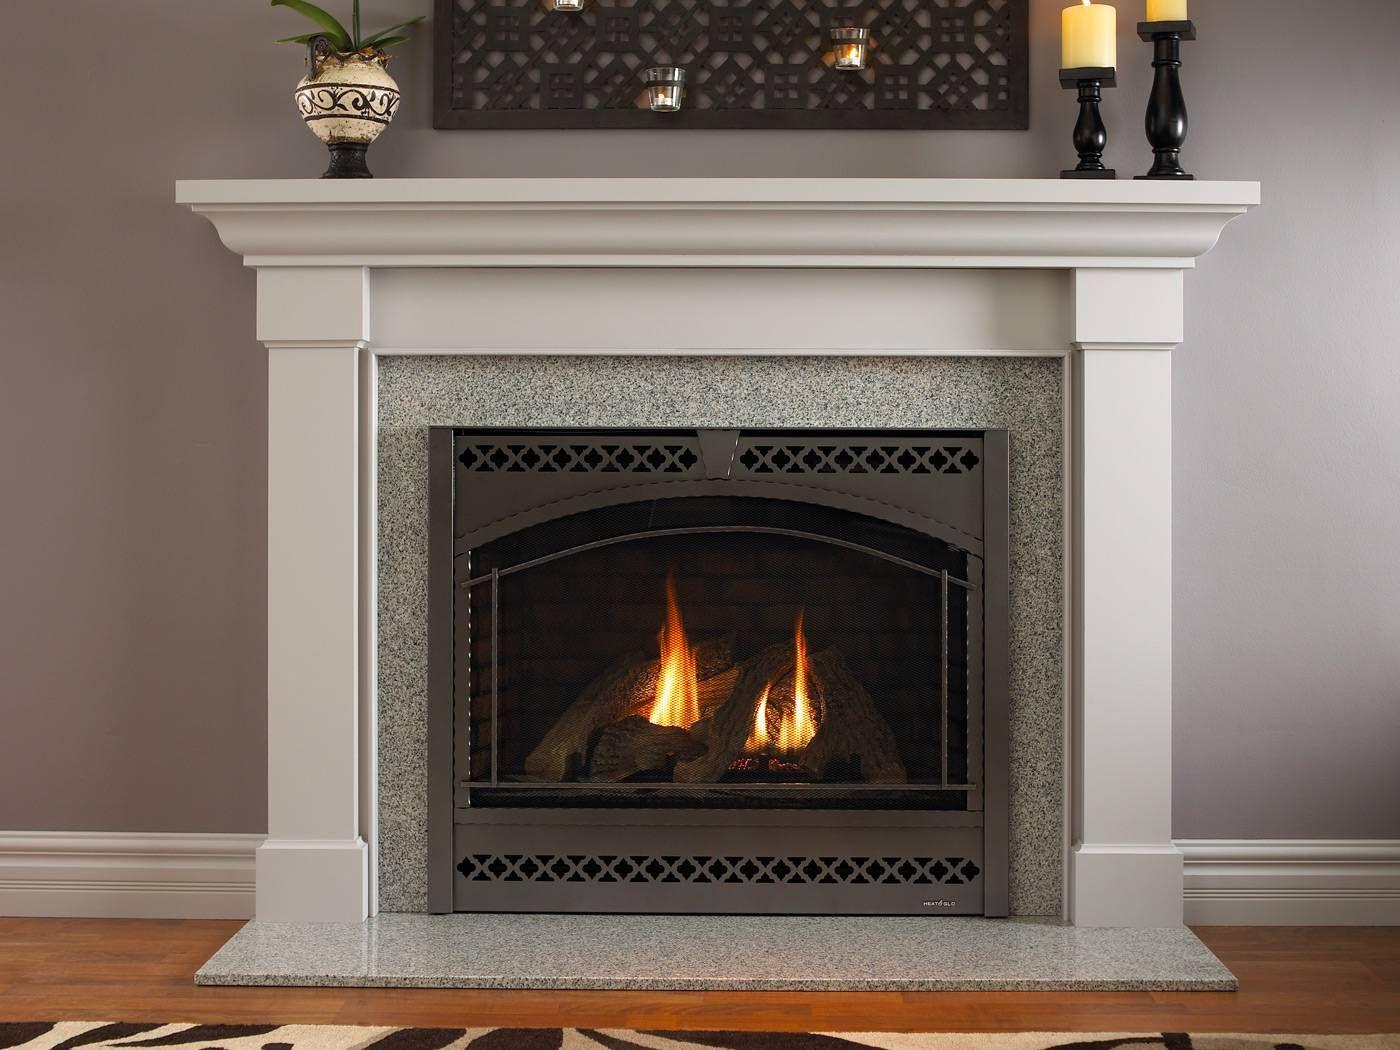 Heat glo sl 950 slim line gas fireplace accessories remodel heat glo sl 950 slim line gas fireplace accessories teraionfo